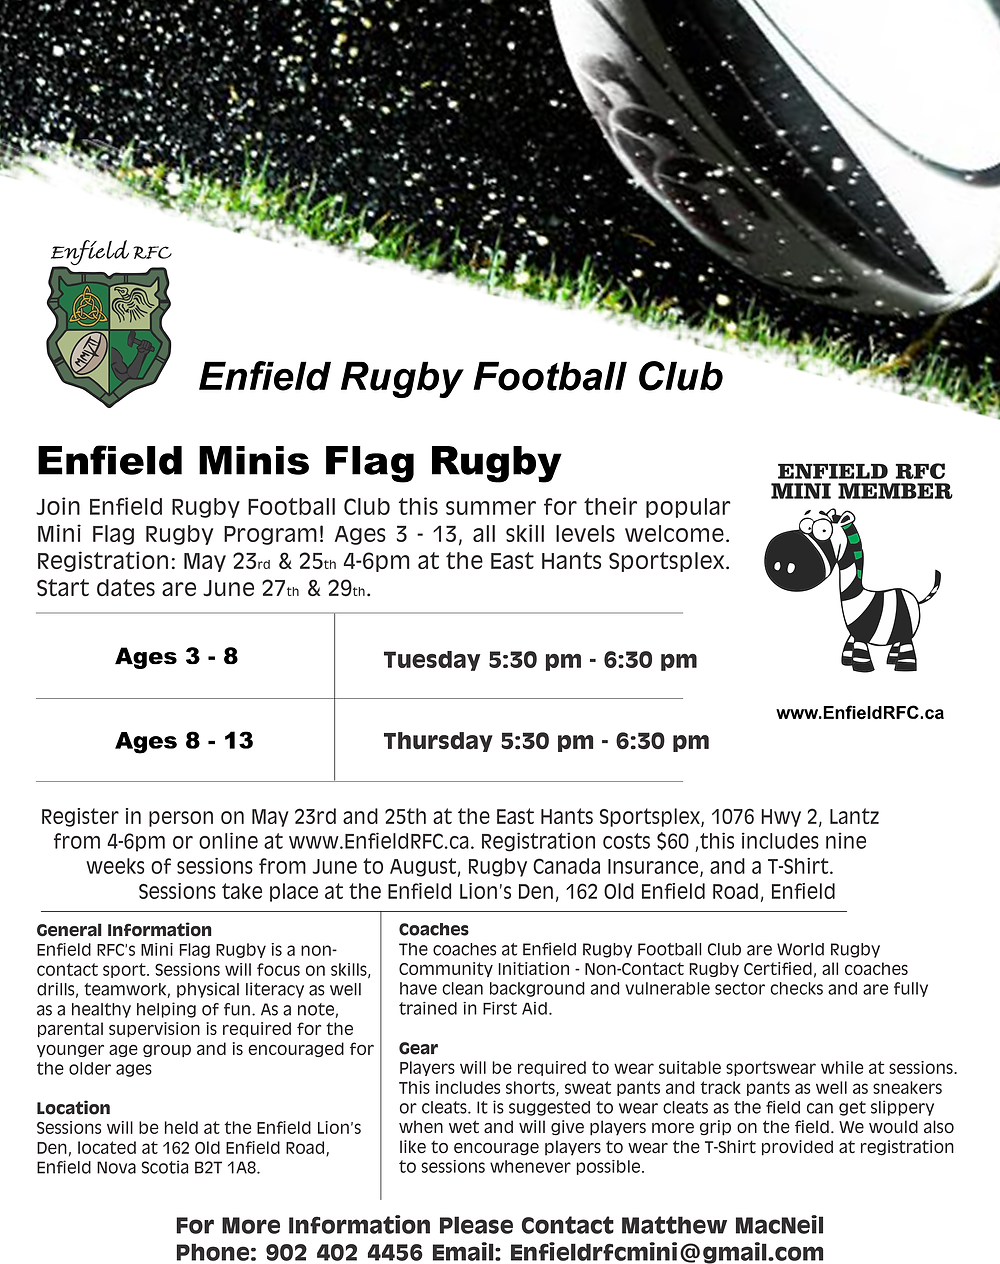 Enfield RFC Mini Rugby 2017